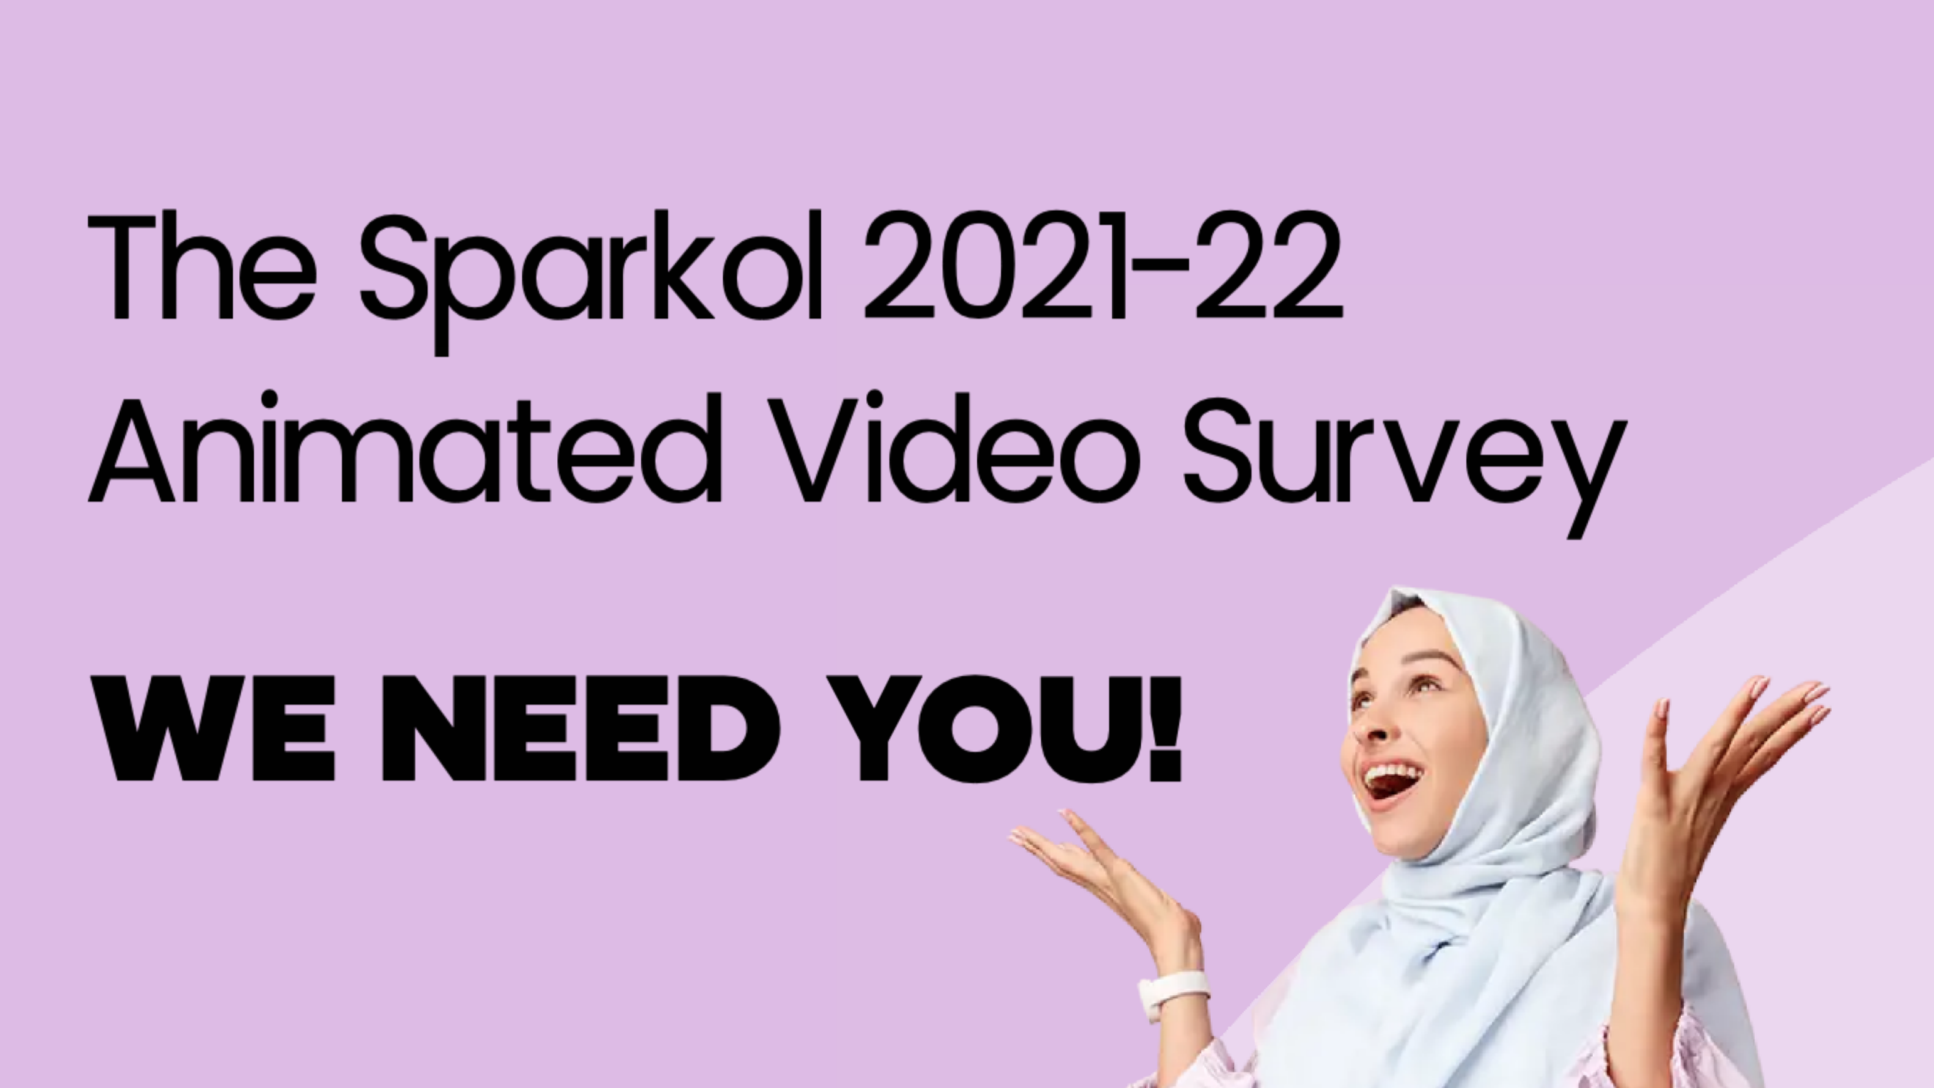 Sparkol animated video survey